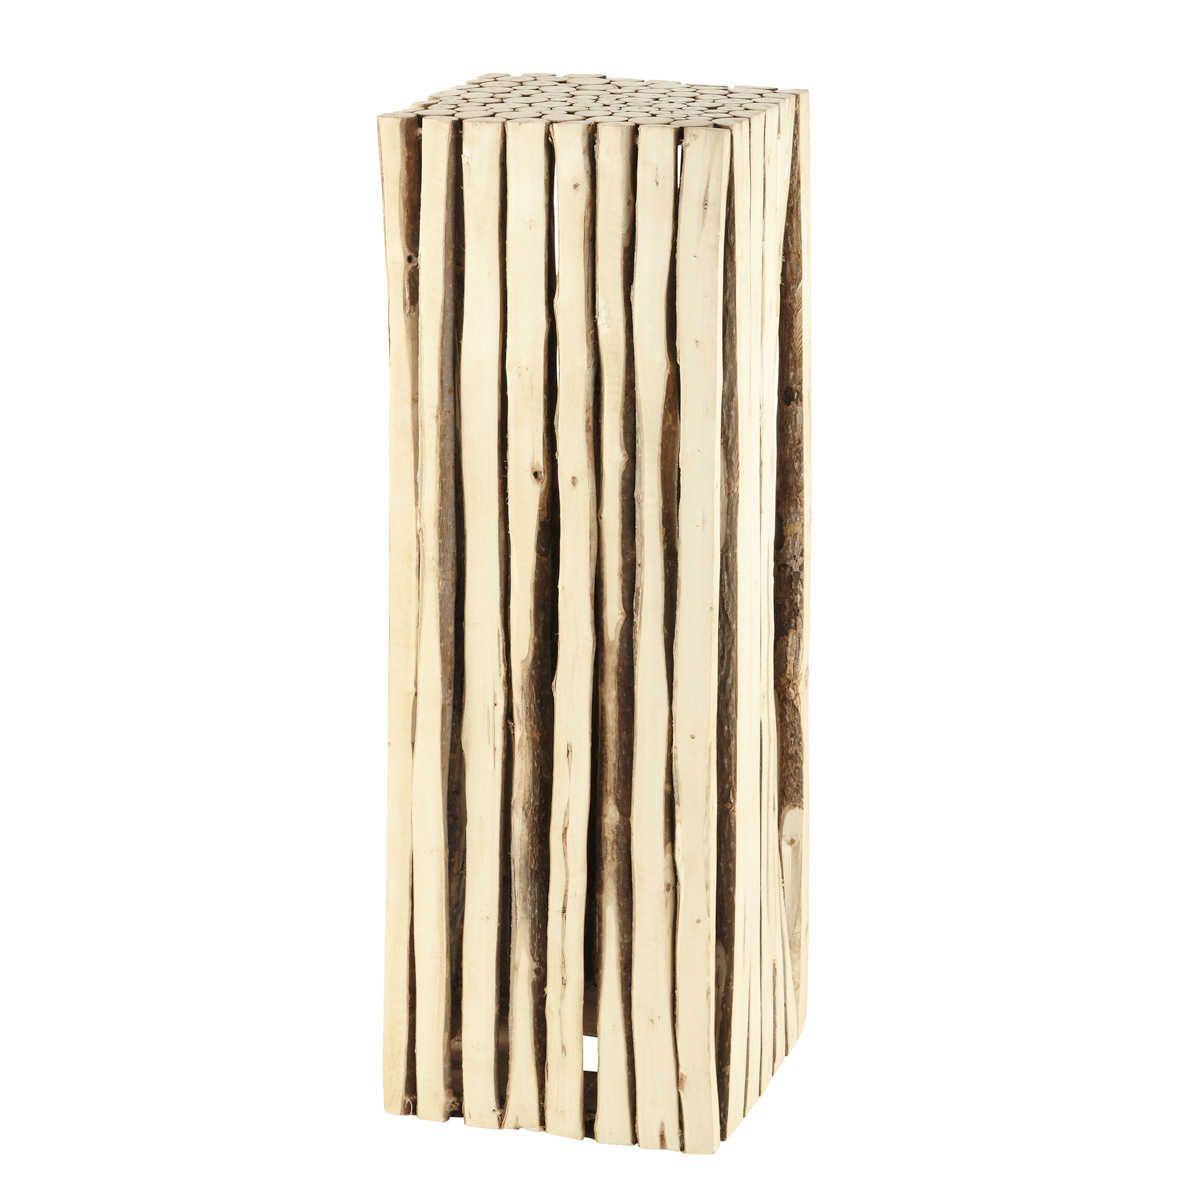 Mobili Maison Du Monde Usati.Meubles D Appoint Wood Columns Beach House Furniture Wood